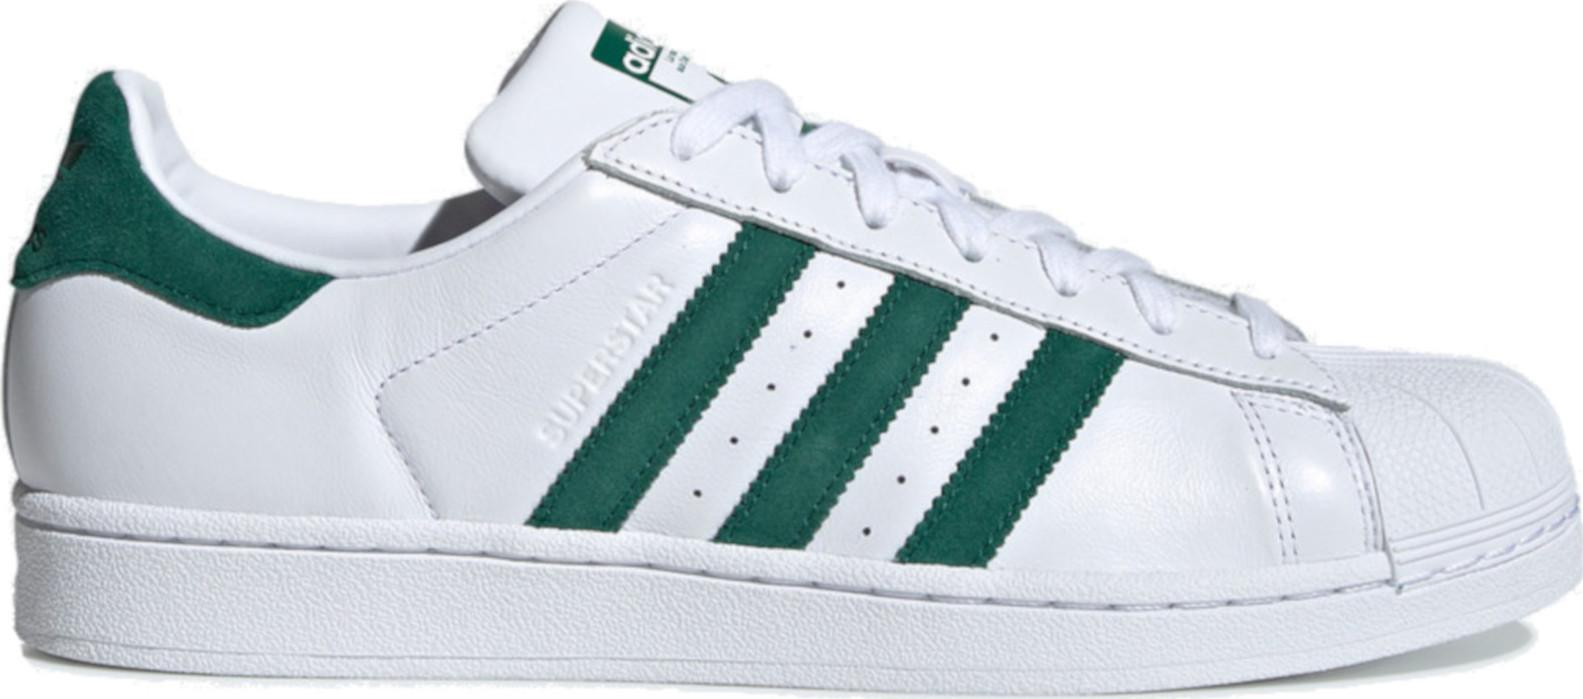 Adidas Superstar EE4473